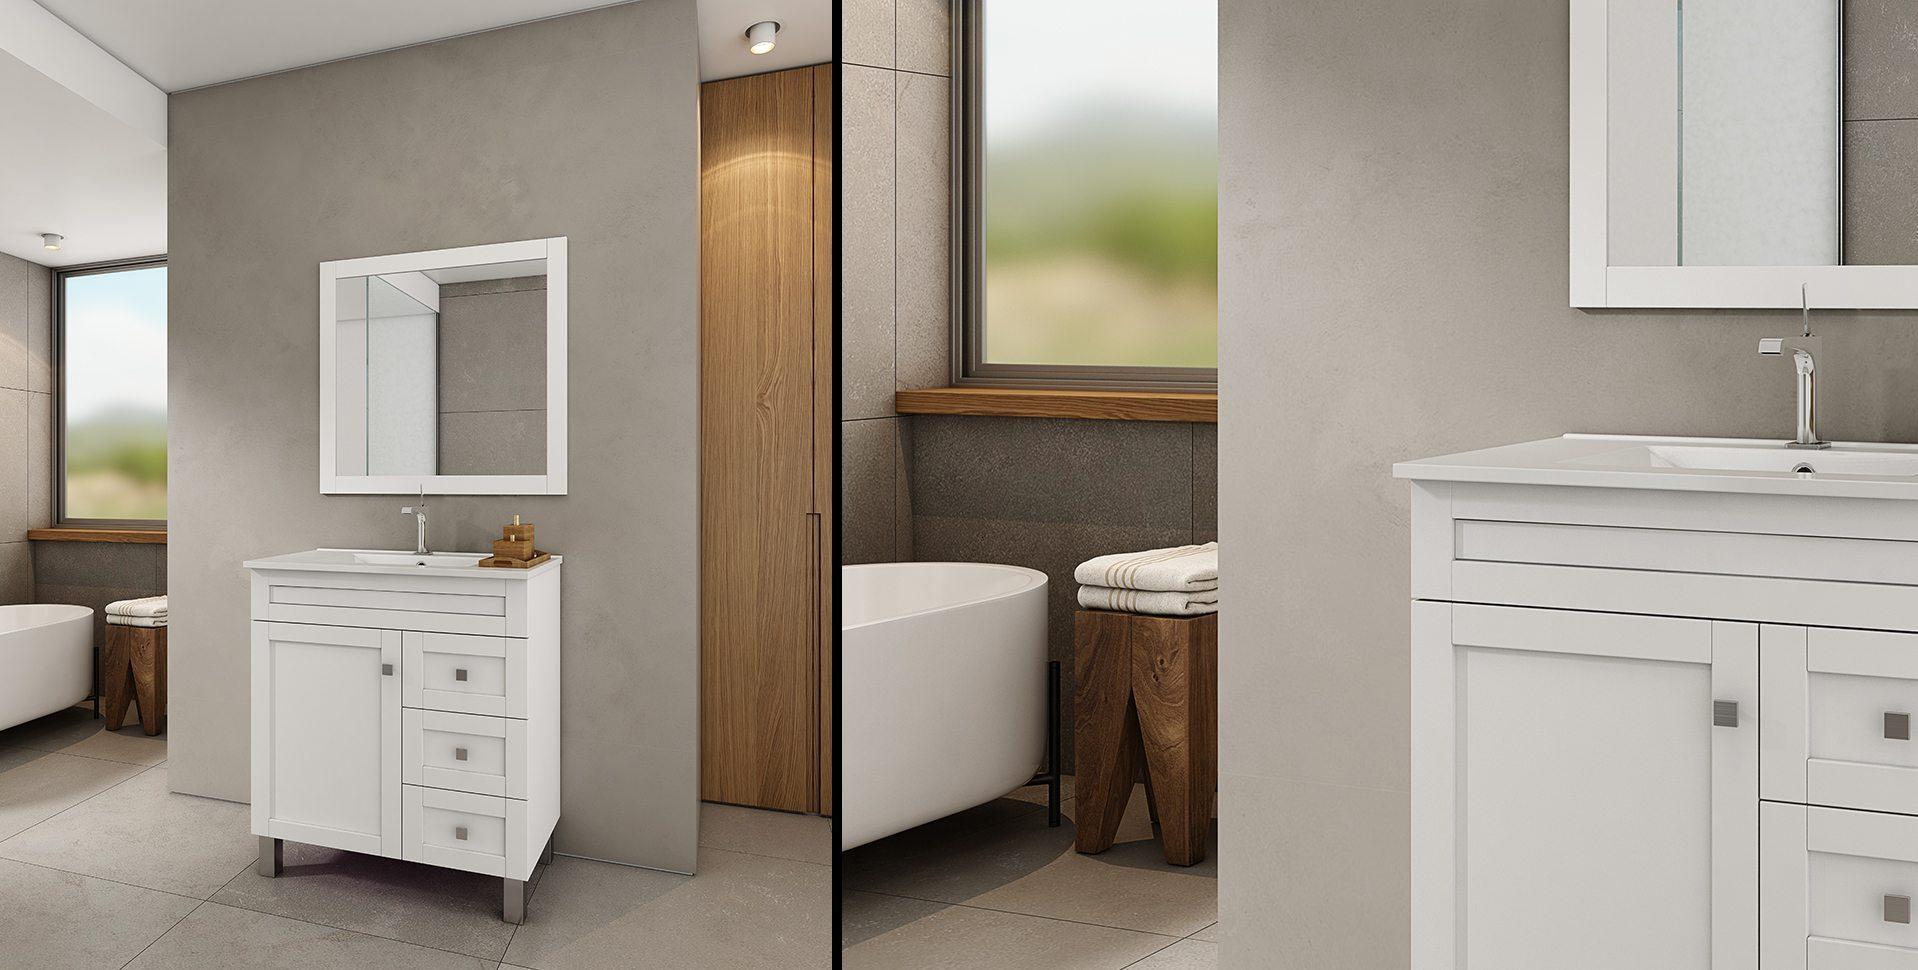 Product Visualization: Bathroom Cabinets by El-Gal, Bathroom interior Design